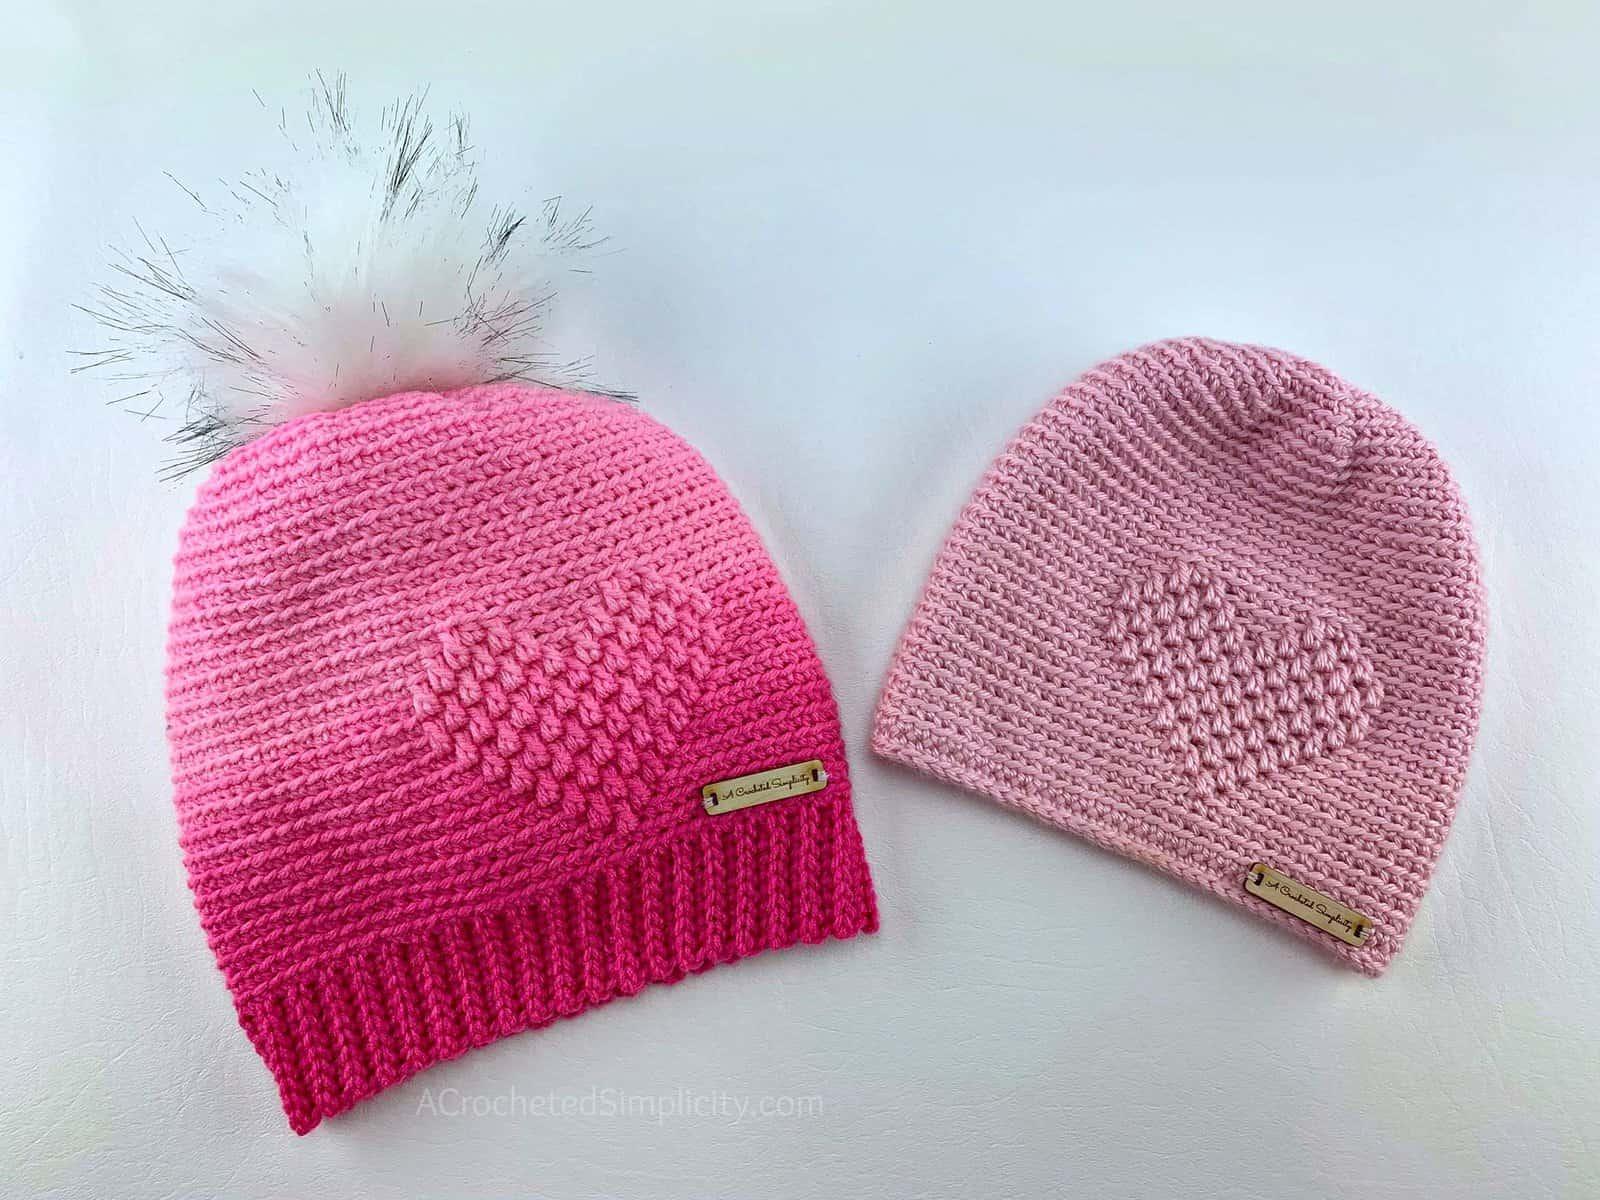 Free Crochet Hat Pattern - My Love Beanie & Slouch by A Crocheted Simplicity #freecrochetpattern #embossedcrochet #embossedheart #embossedheartcrochethat #crochethearthatpattern #crochetheartpattern #freecrochethatpattern